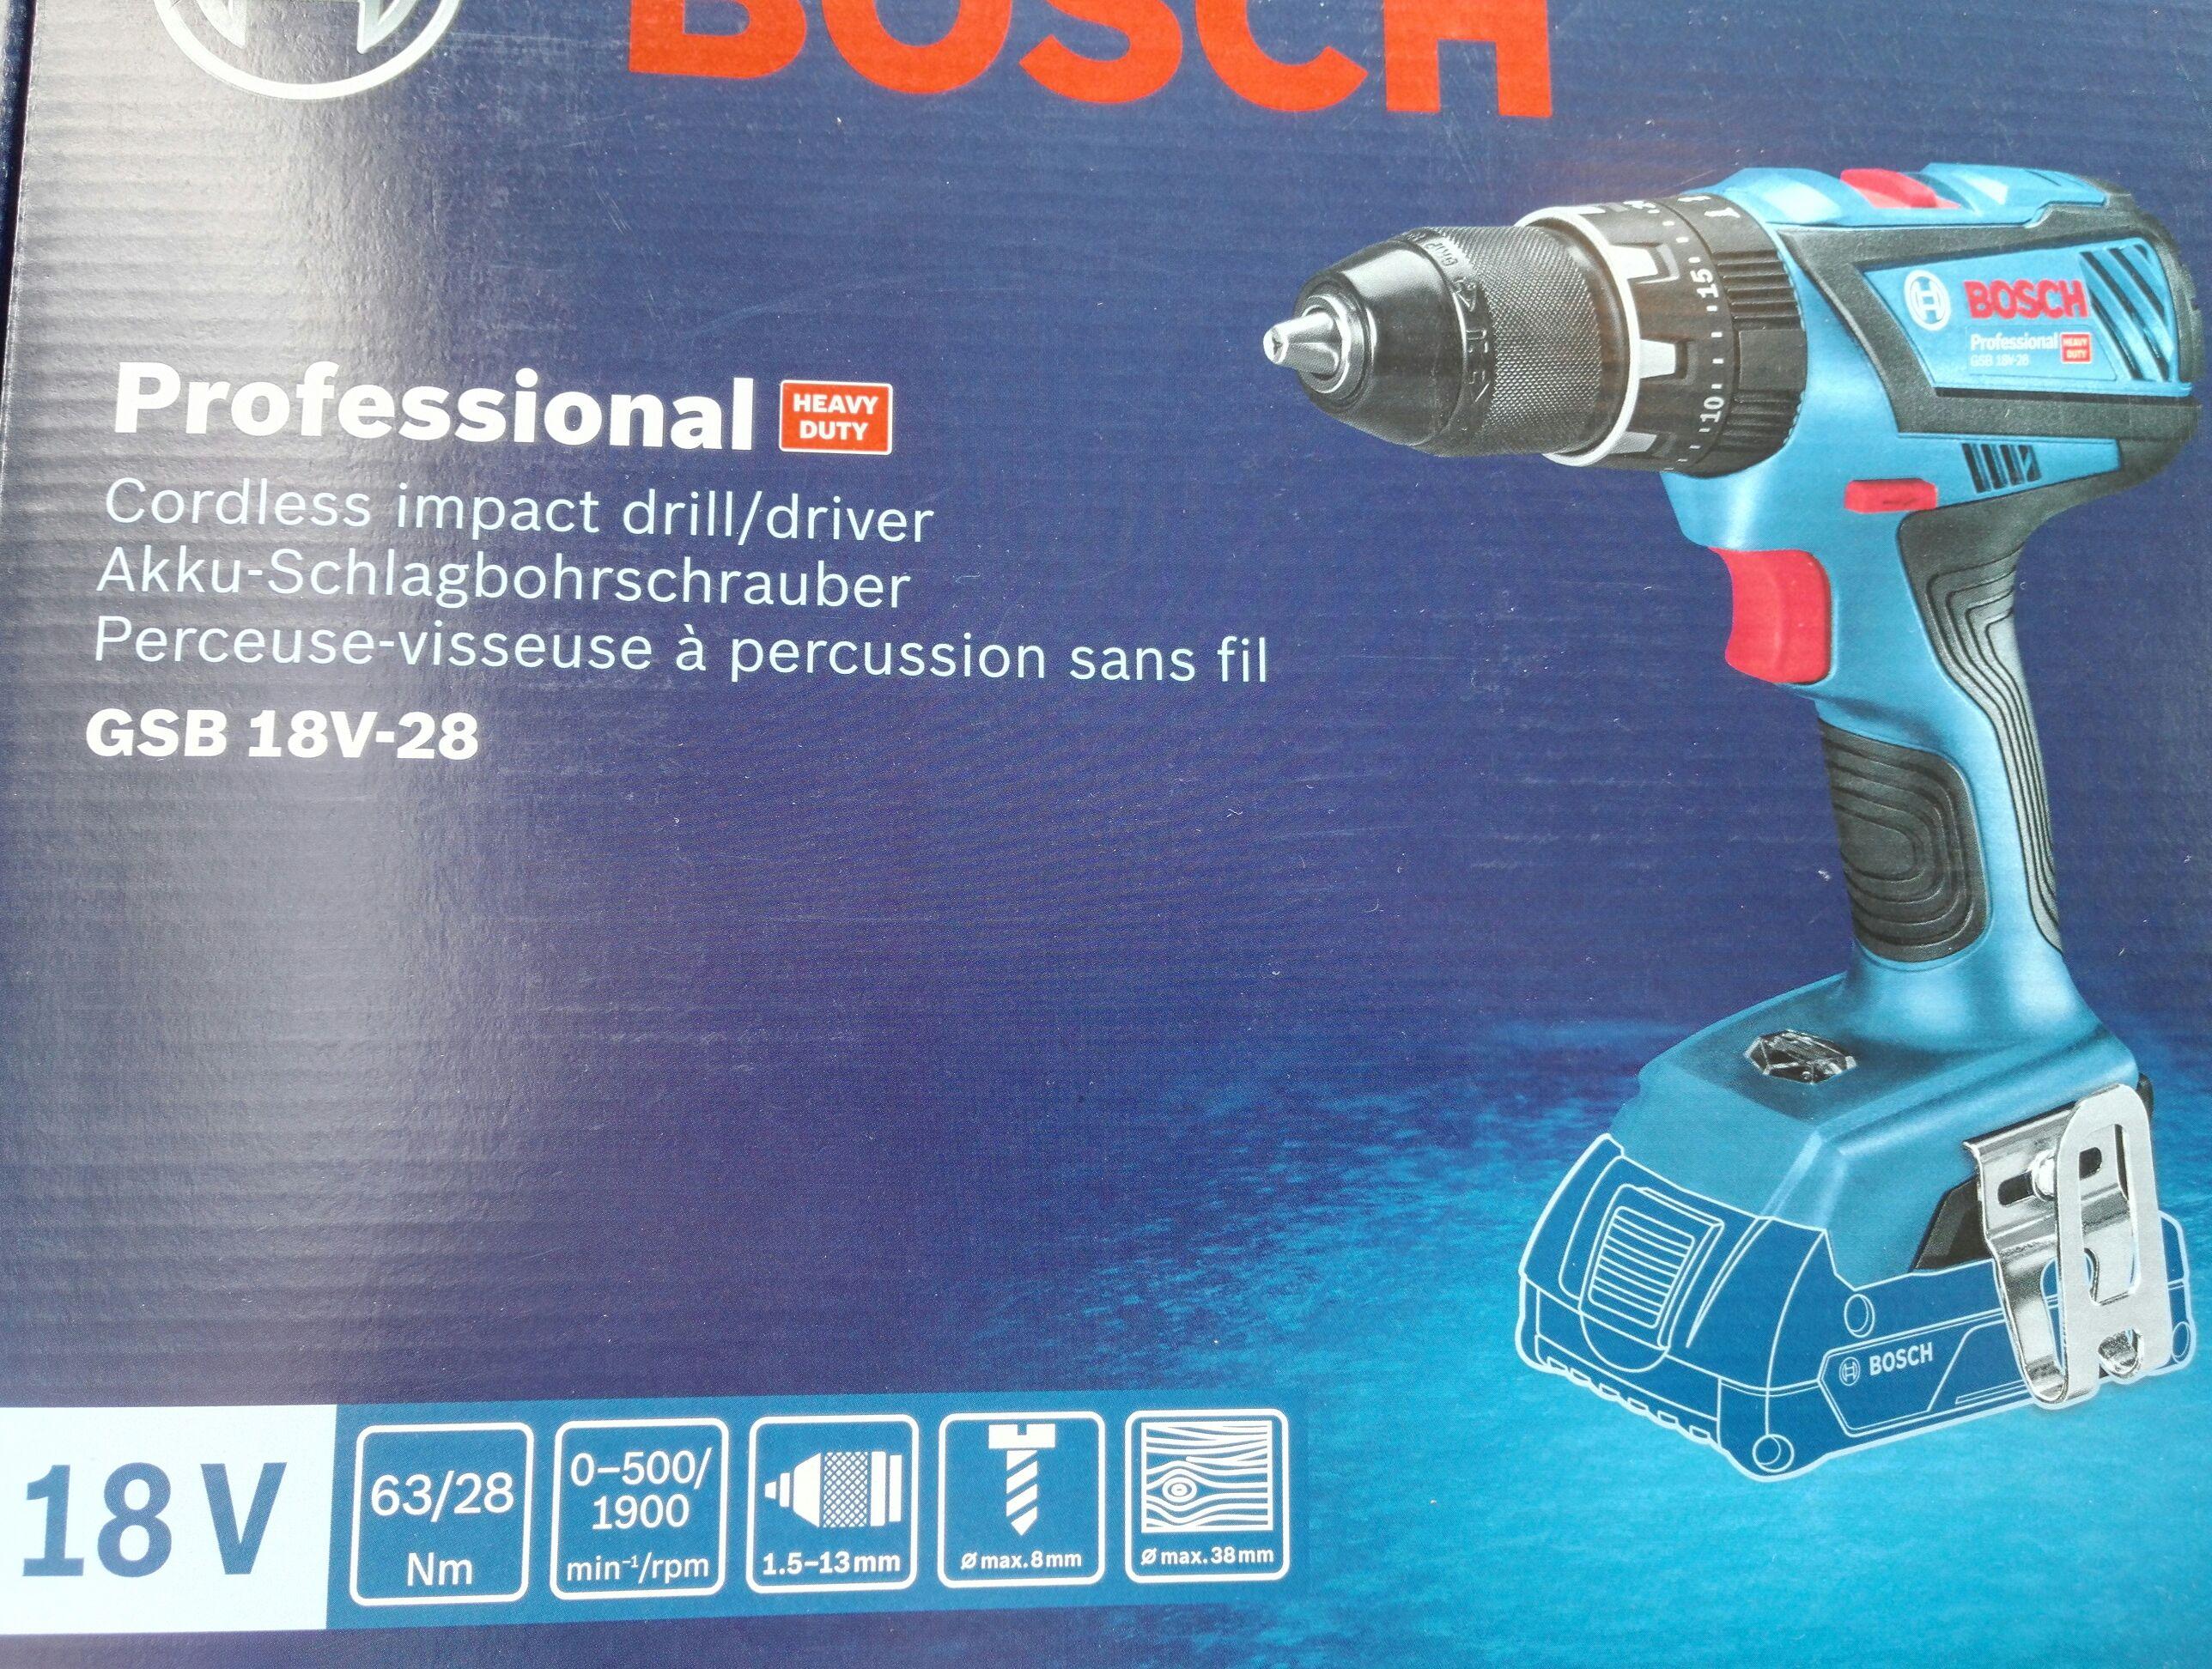 [Hornbach Lokal TPG] Bosch Akku-Schlagbohrschrauber GSB 18V-28 Professional Solo - 06019H4000